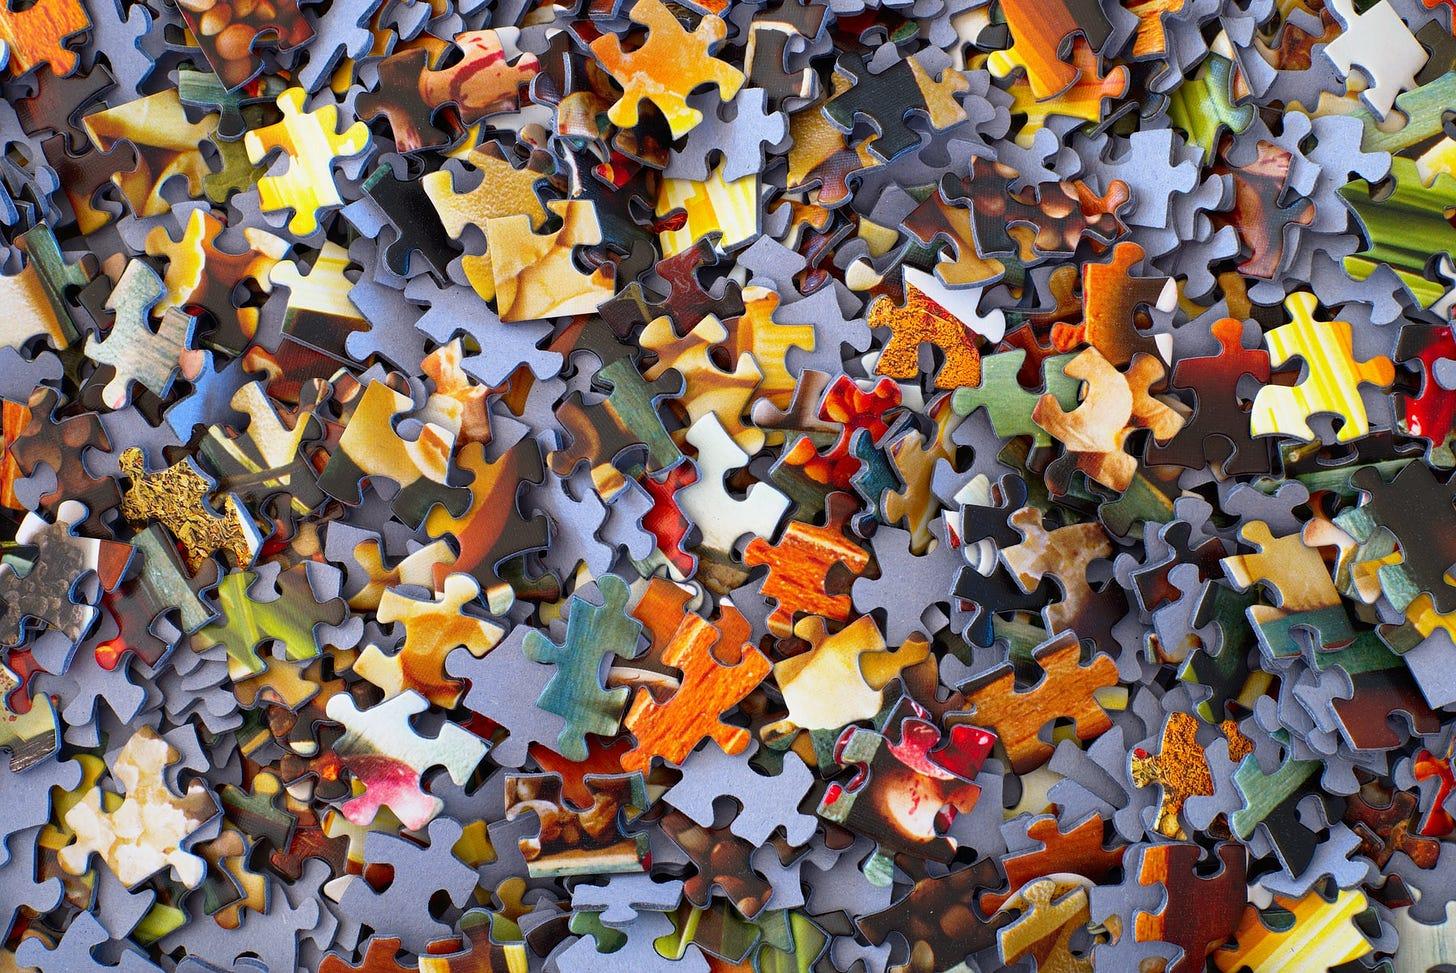 AI Ethics #17: Trustworthy ML, Decolonial AI, organized social media manipulation, digital sock puppets, unpredictability of AI and more ...